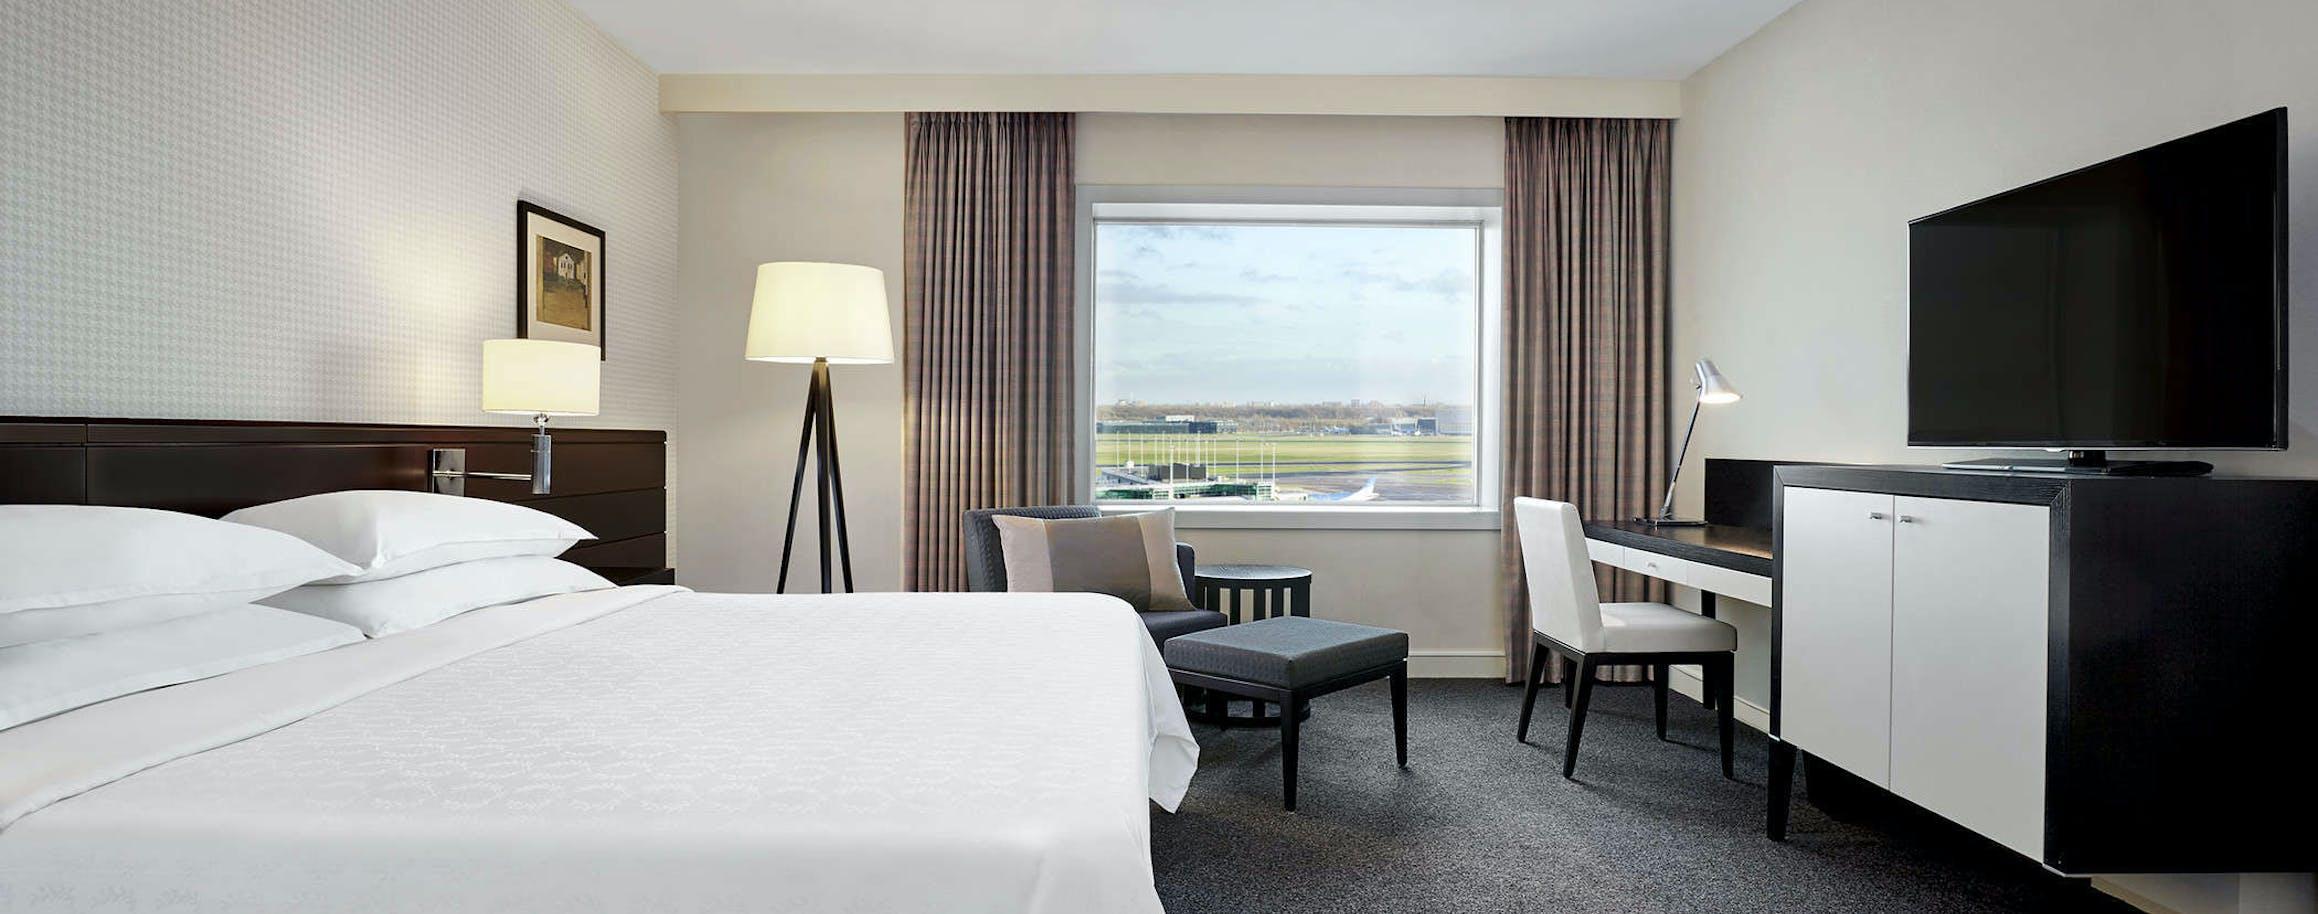 Sheraton Amsterdam Airport Hotel & Conference Center ...